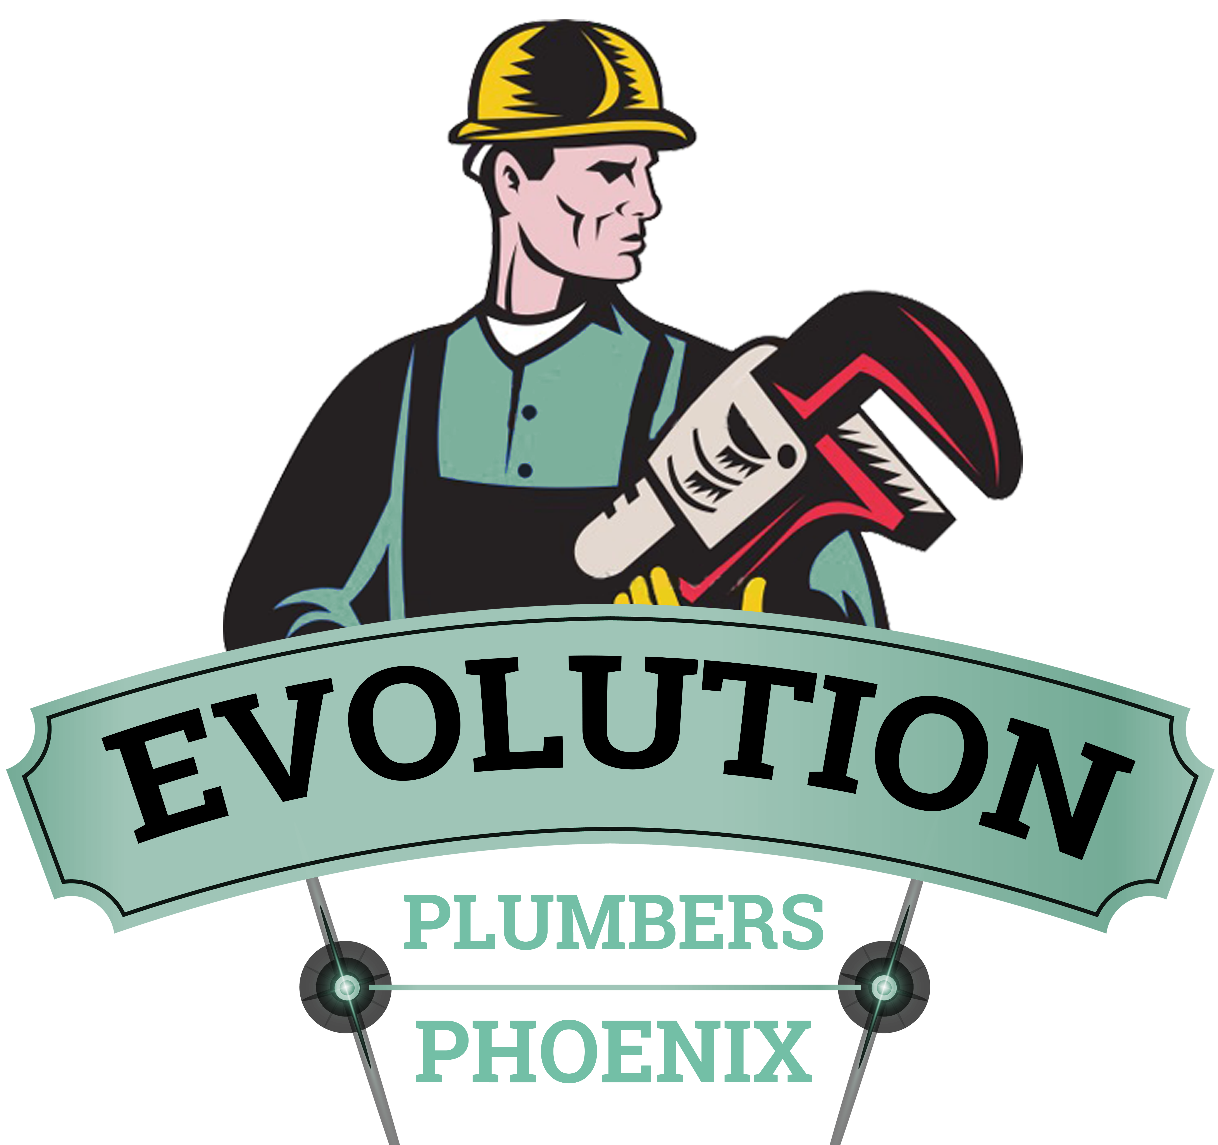 Plumber clipart plumbing repair. Phoenix az offers licensed